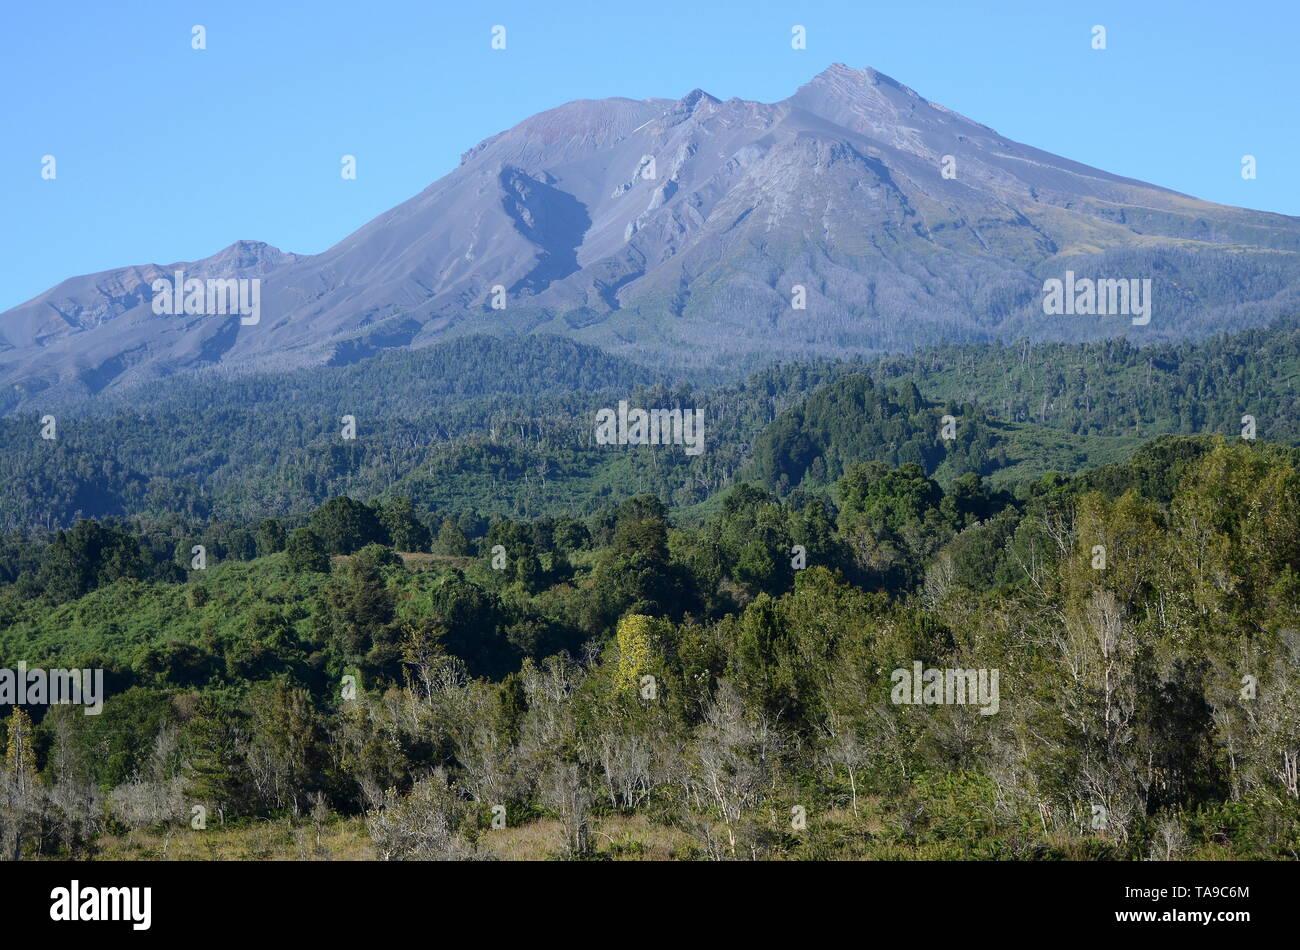 CALBUCO VOLCANO IN CHILE. - Stock Image